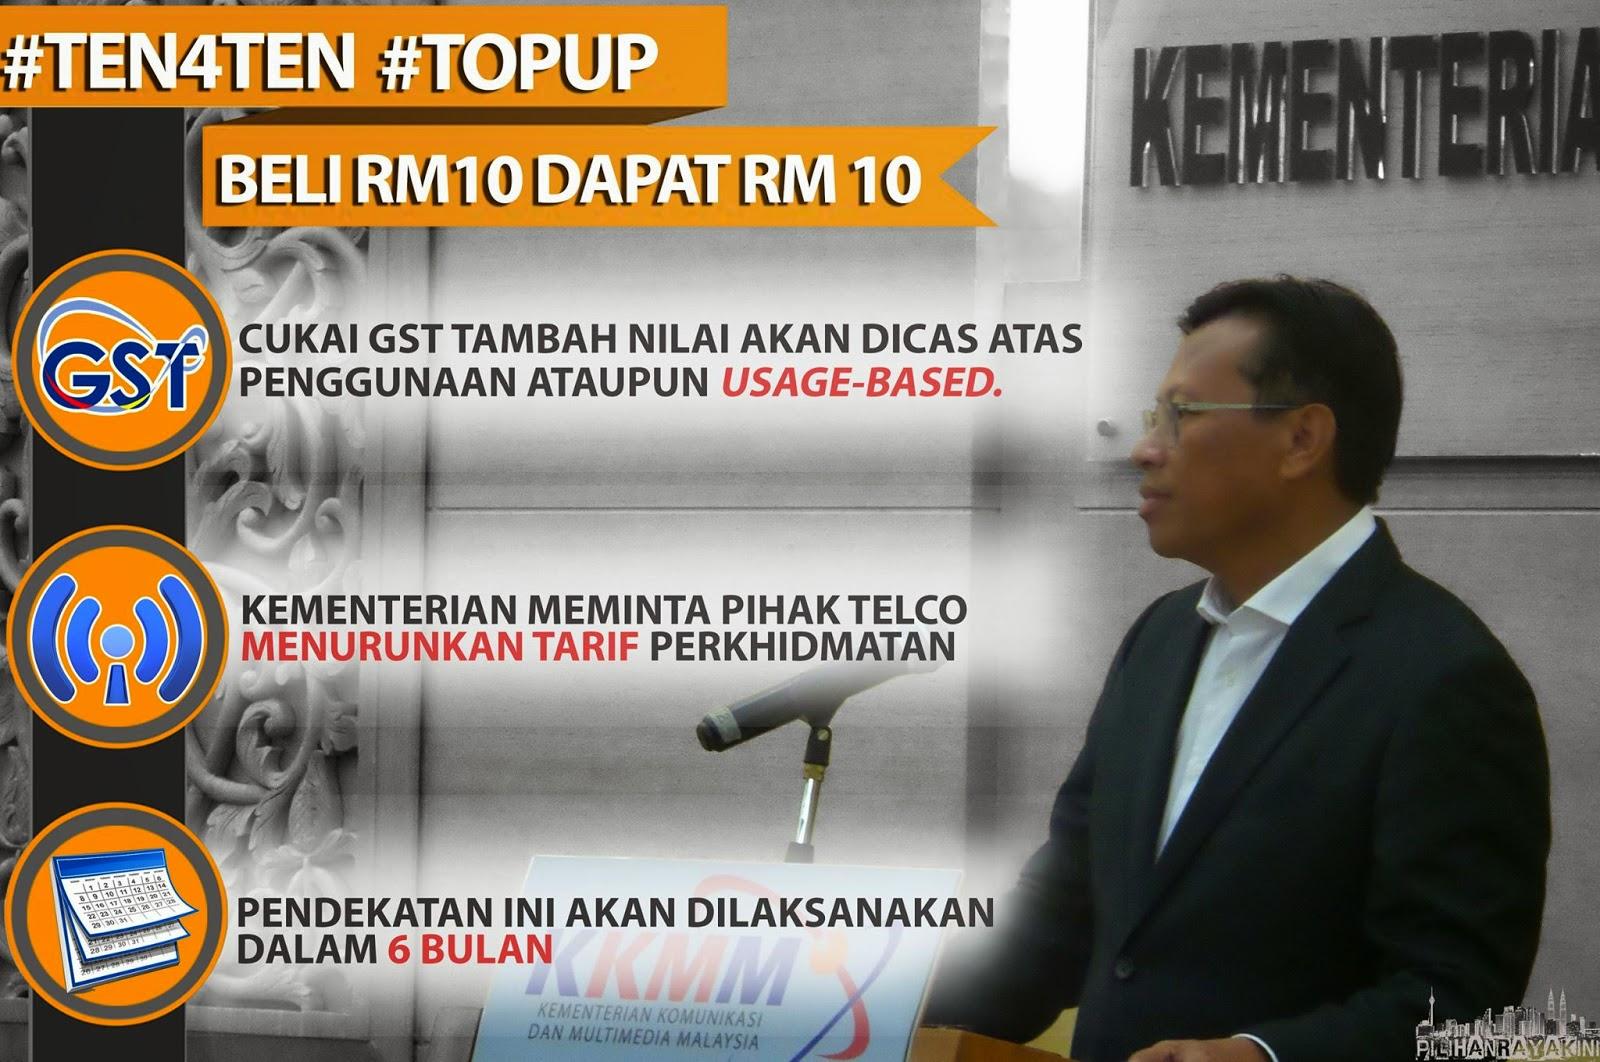 Kabinet setuju cadangan tambah nilai prabayar rm10 dapat rm10 menteri kkmm pilihanraya kini - Kabinet multimedia ...